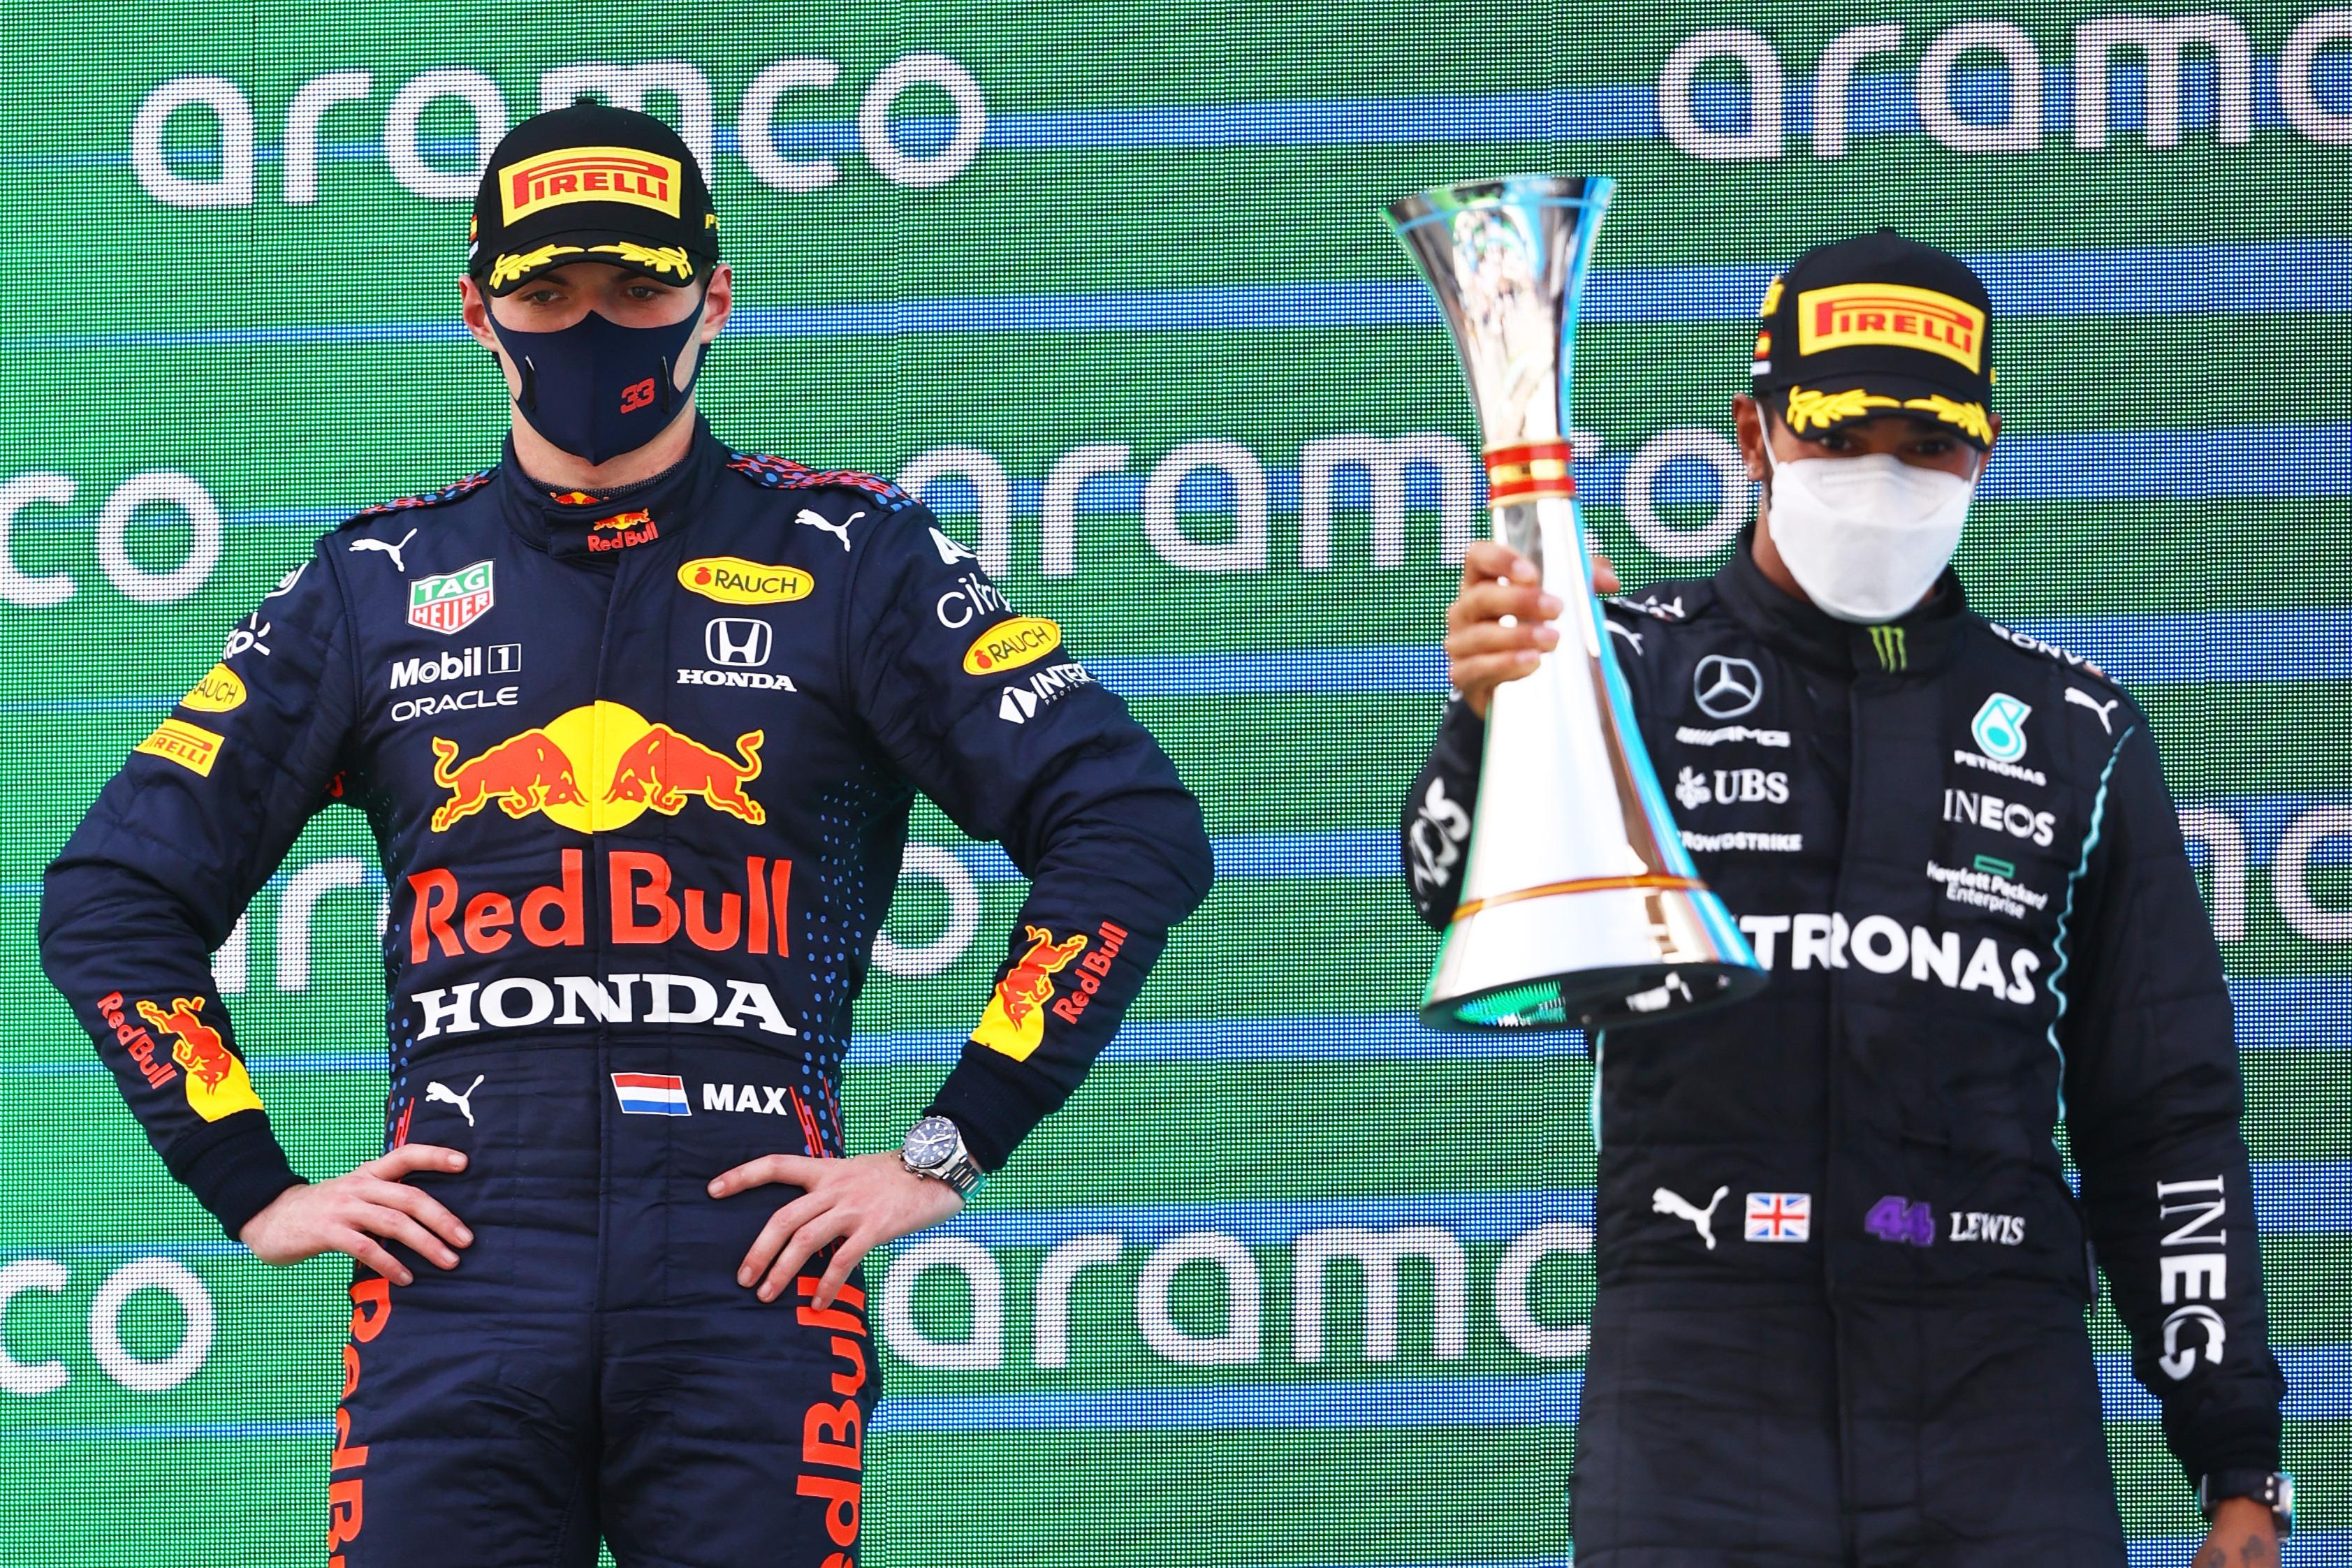 Verstappen looks on as Hamilton hoists his trophy